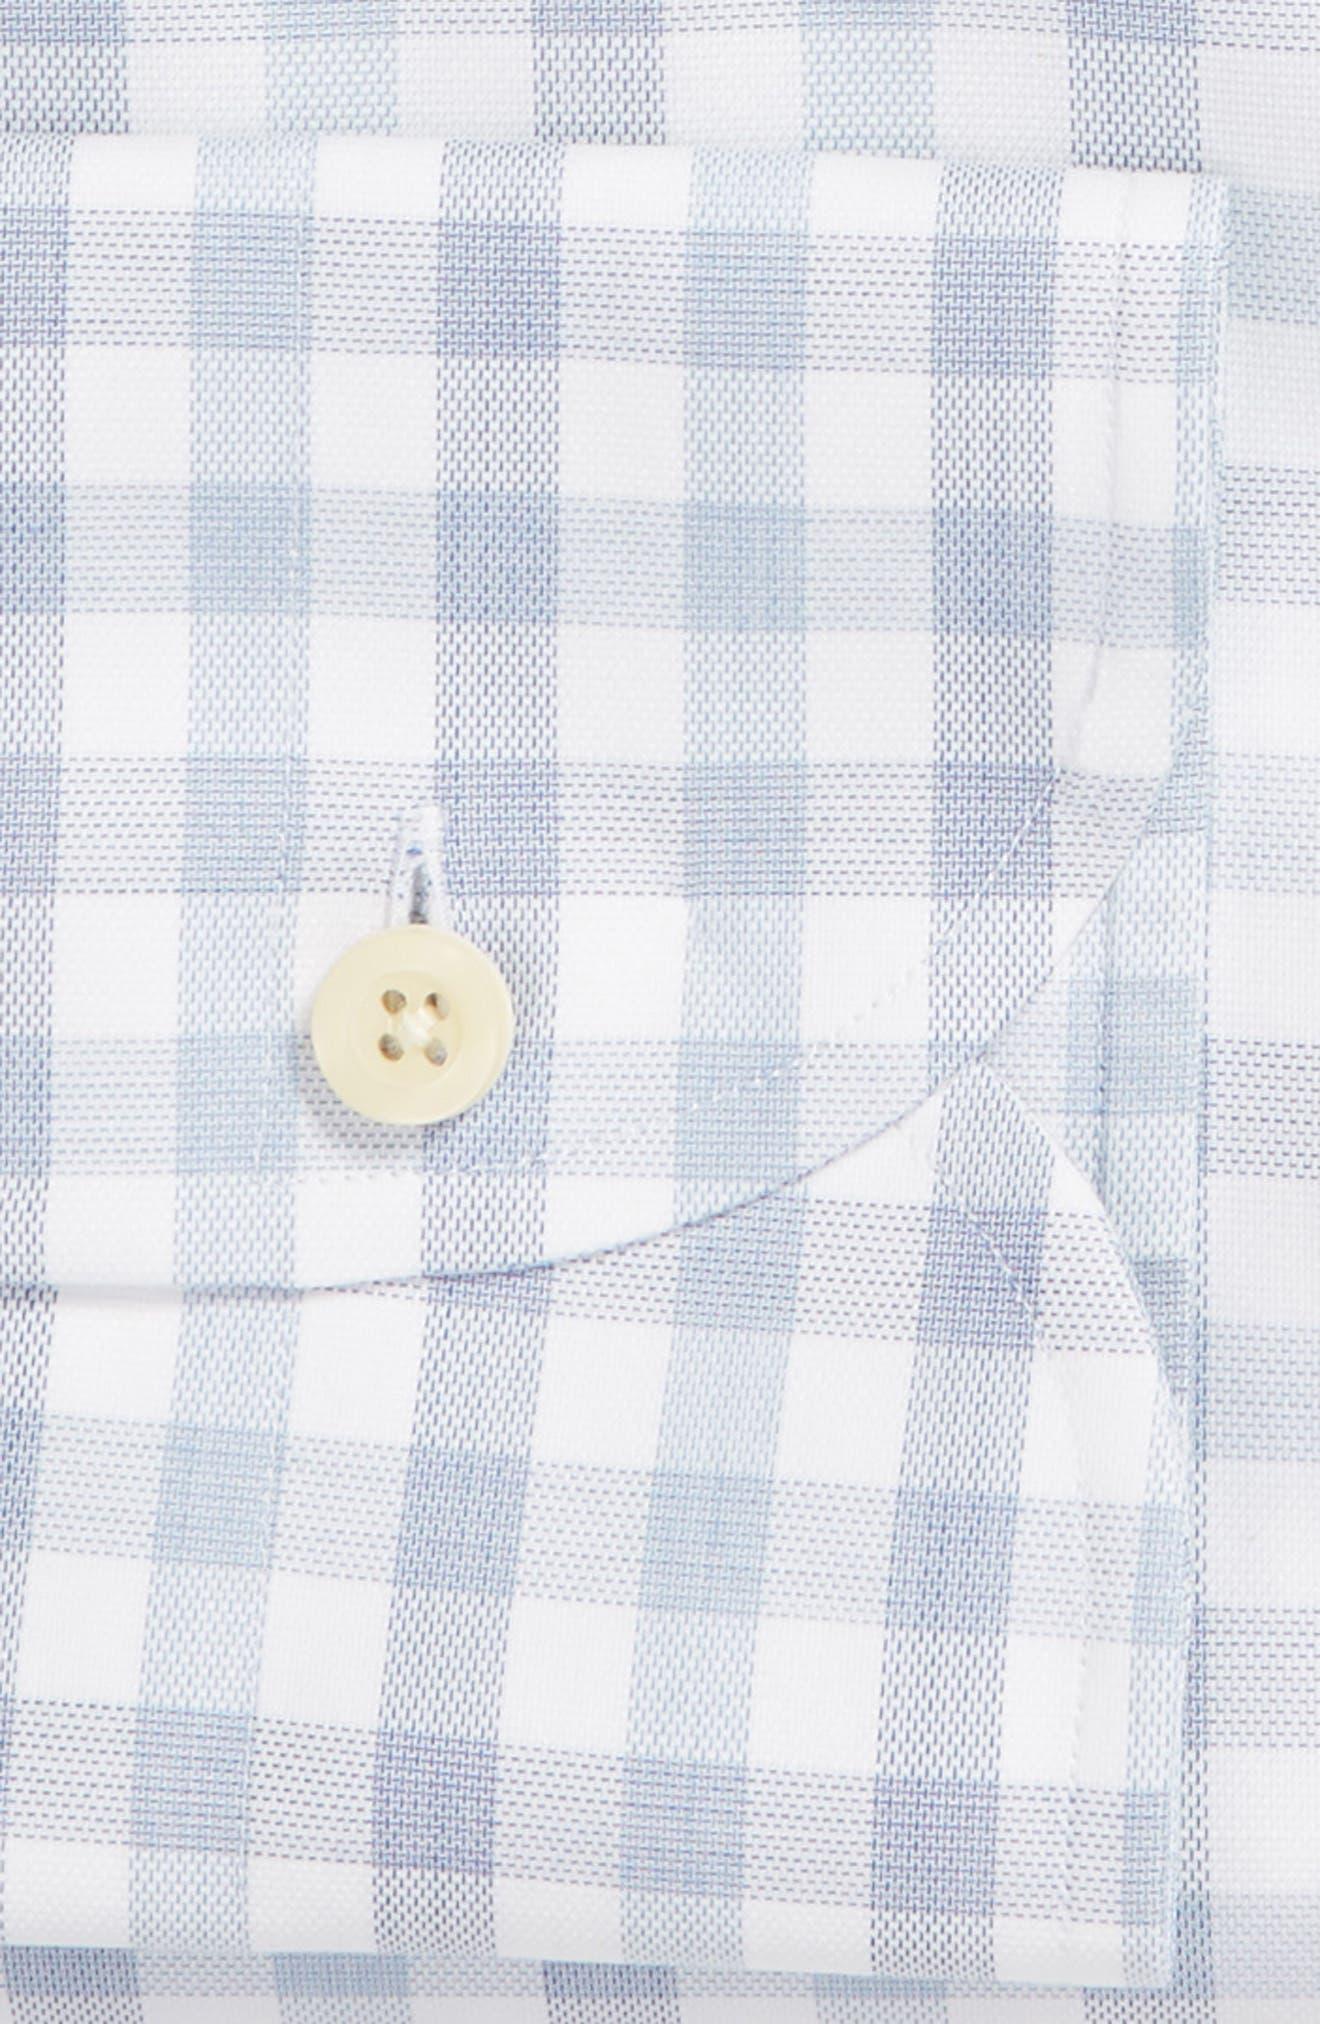 Corbly Trim Fit Check Dress Shirt,                             Alternate thumbnail 6, color,                             LIGHT BLUE